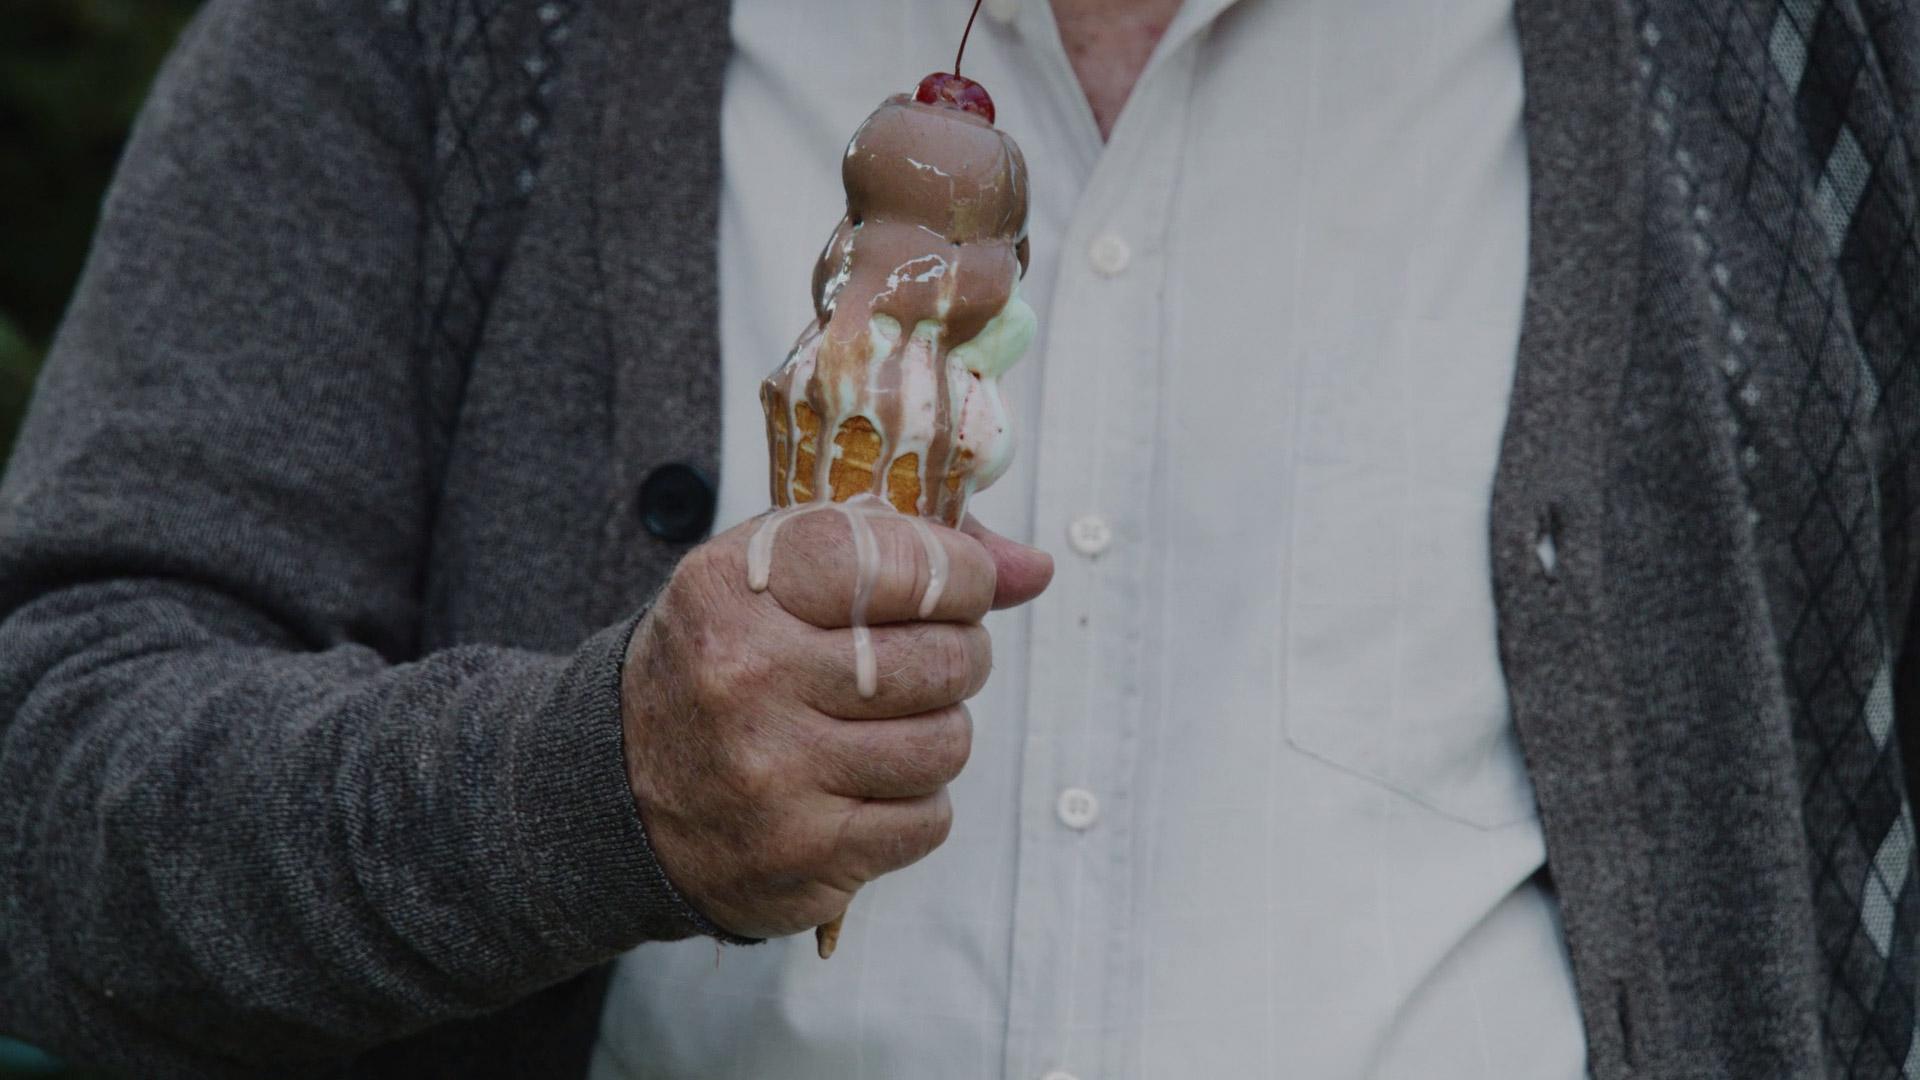 Man holding a melting ice cream cone